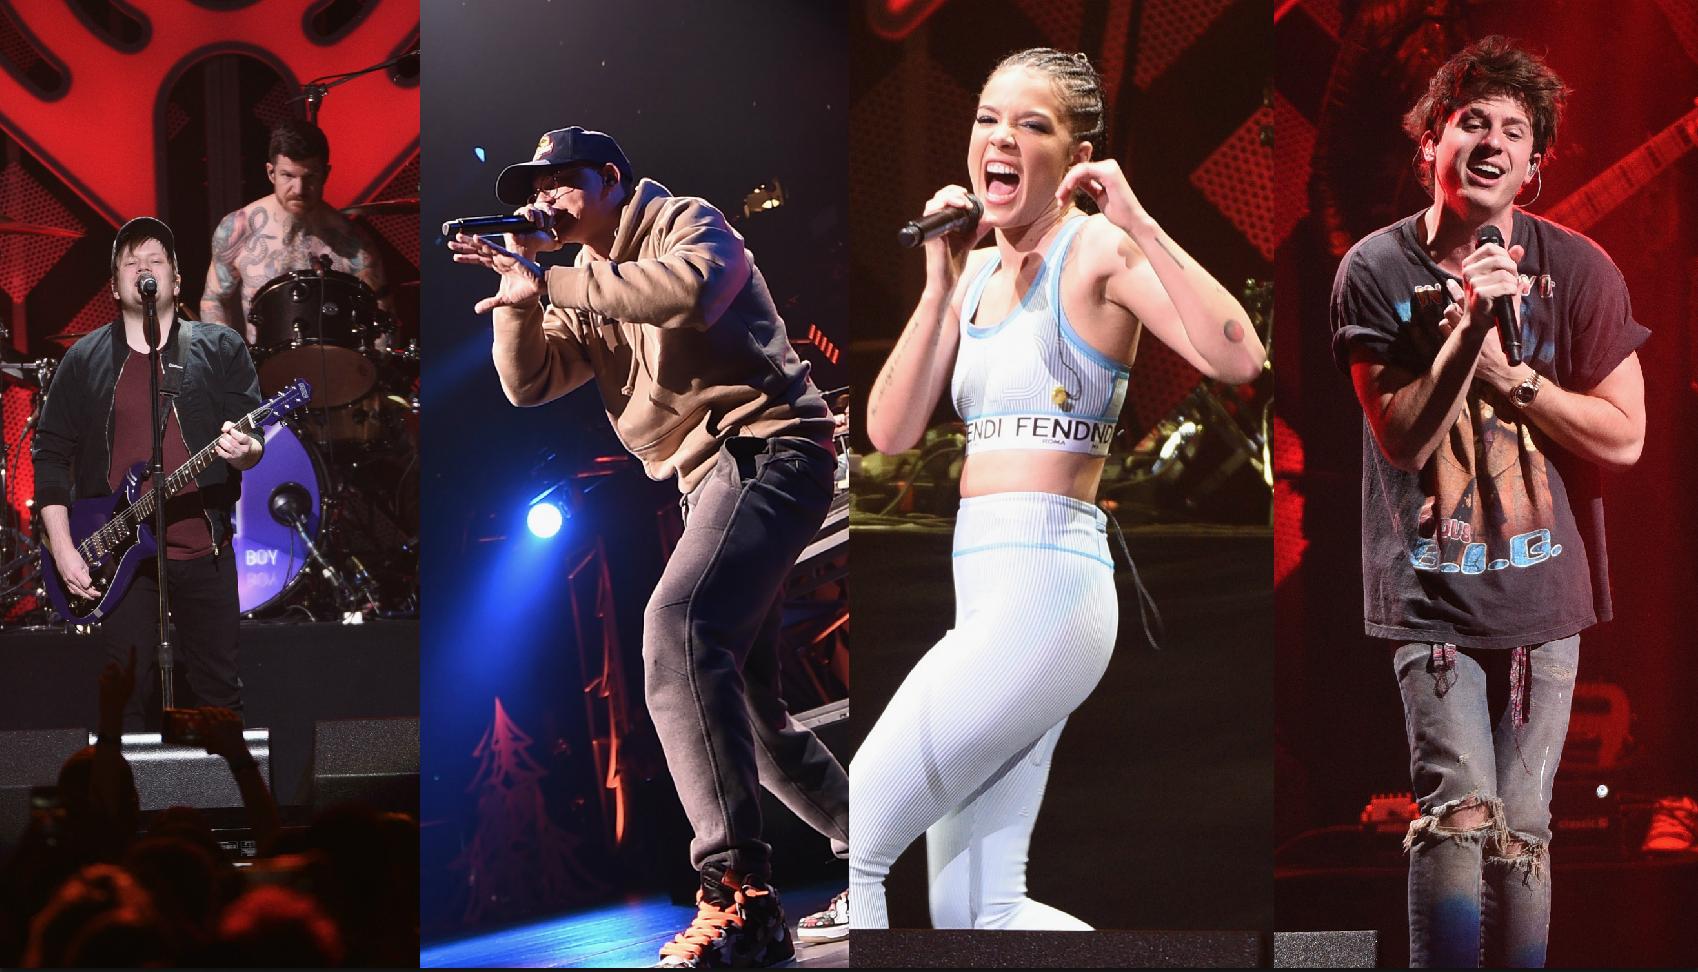 Fall Out Boy, Logic, Halsey, and more rock Q102's Jingle Ball 2017